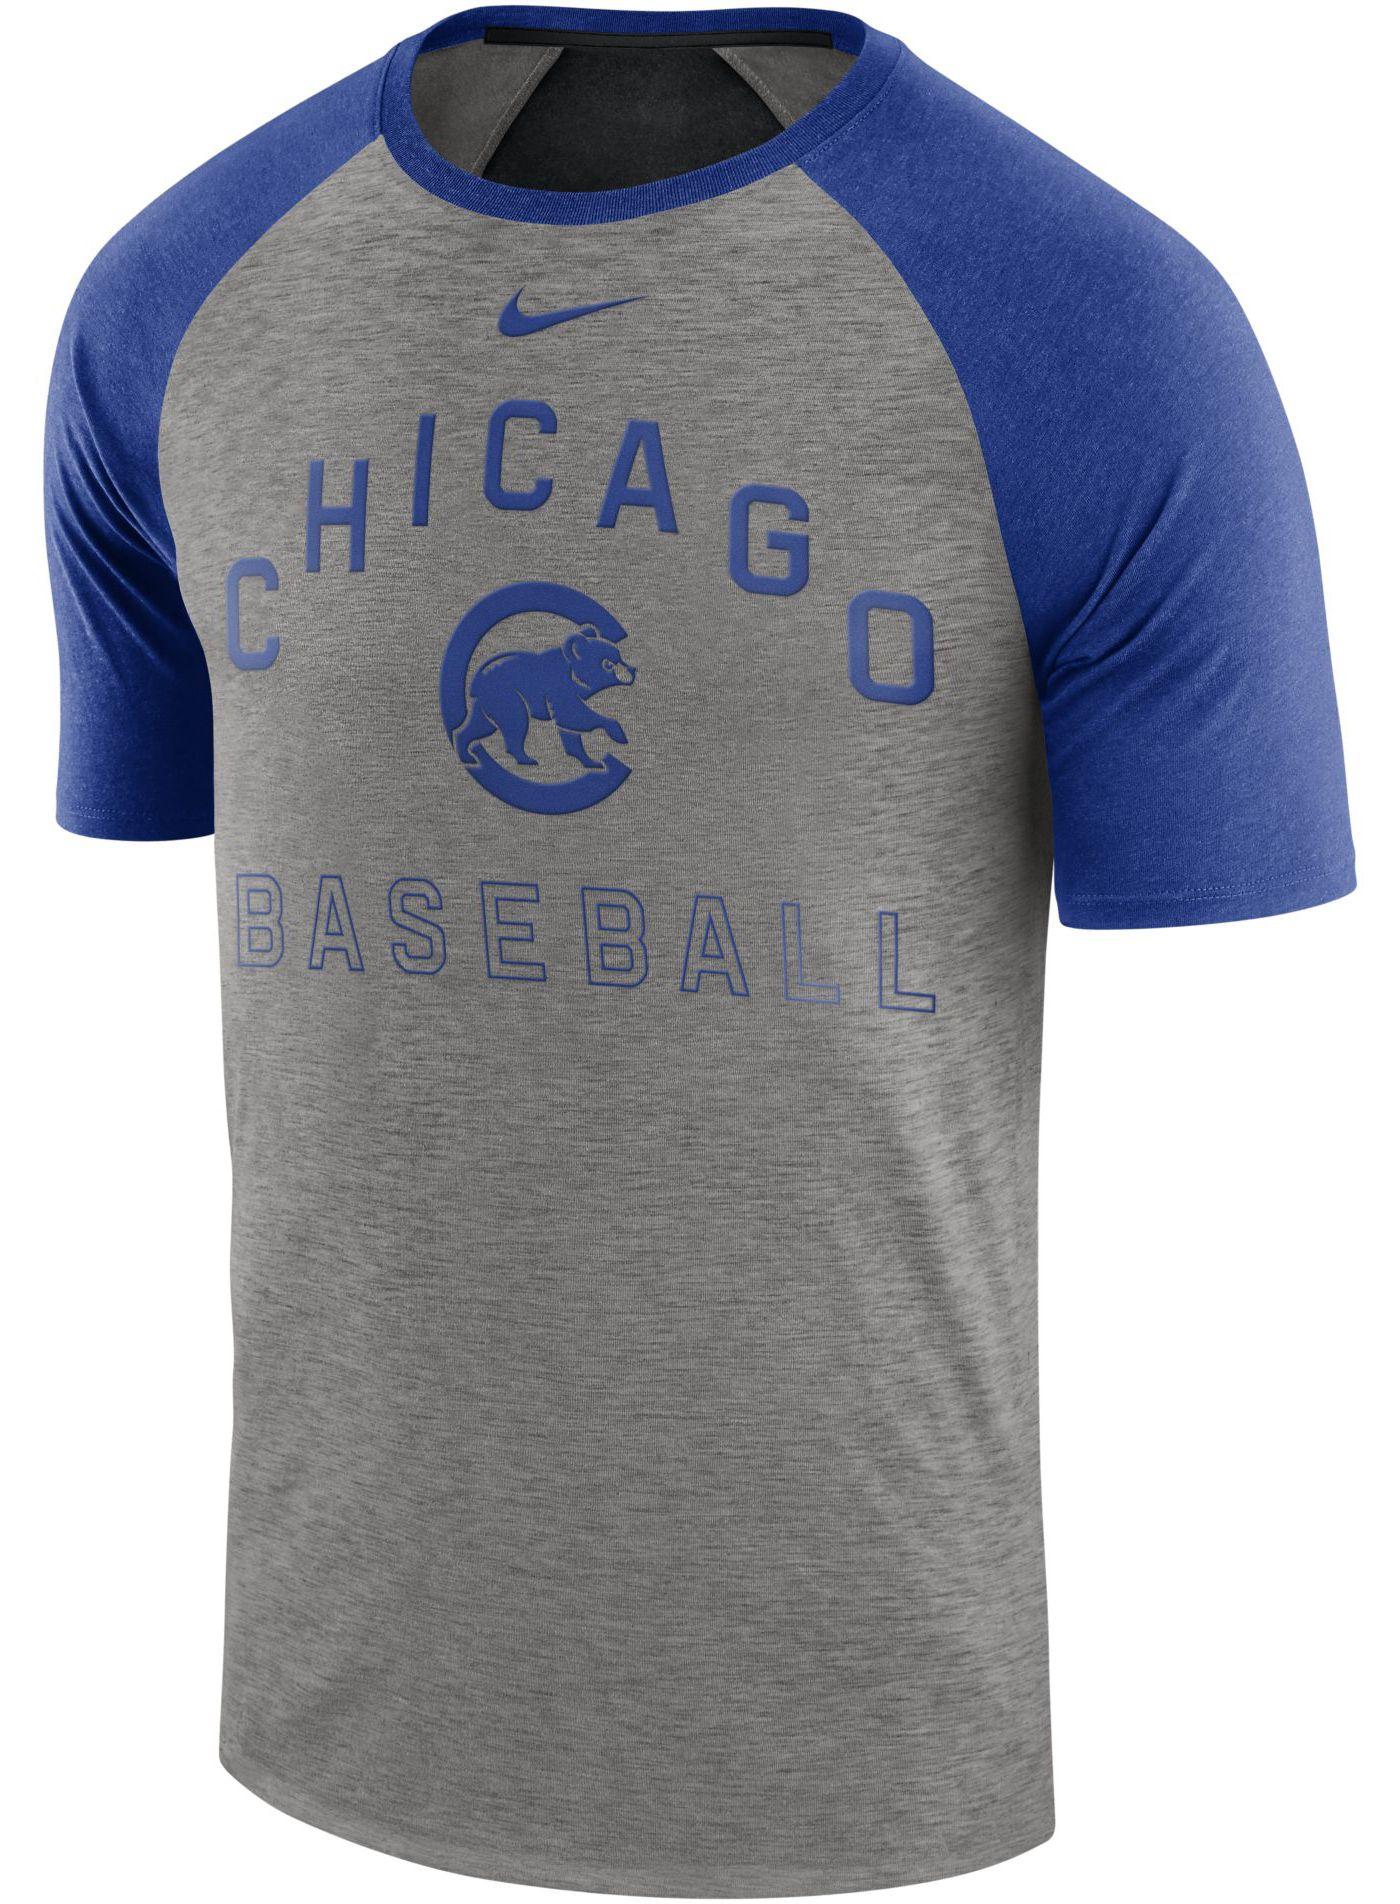 Nike Men's Chicago Cubs Dri-FIT Slub Raglan T-Shirt